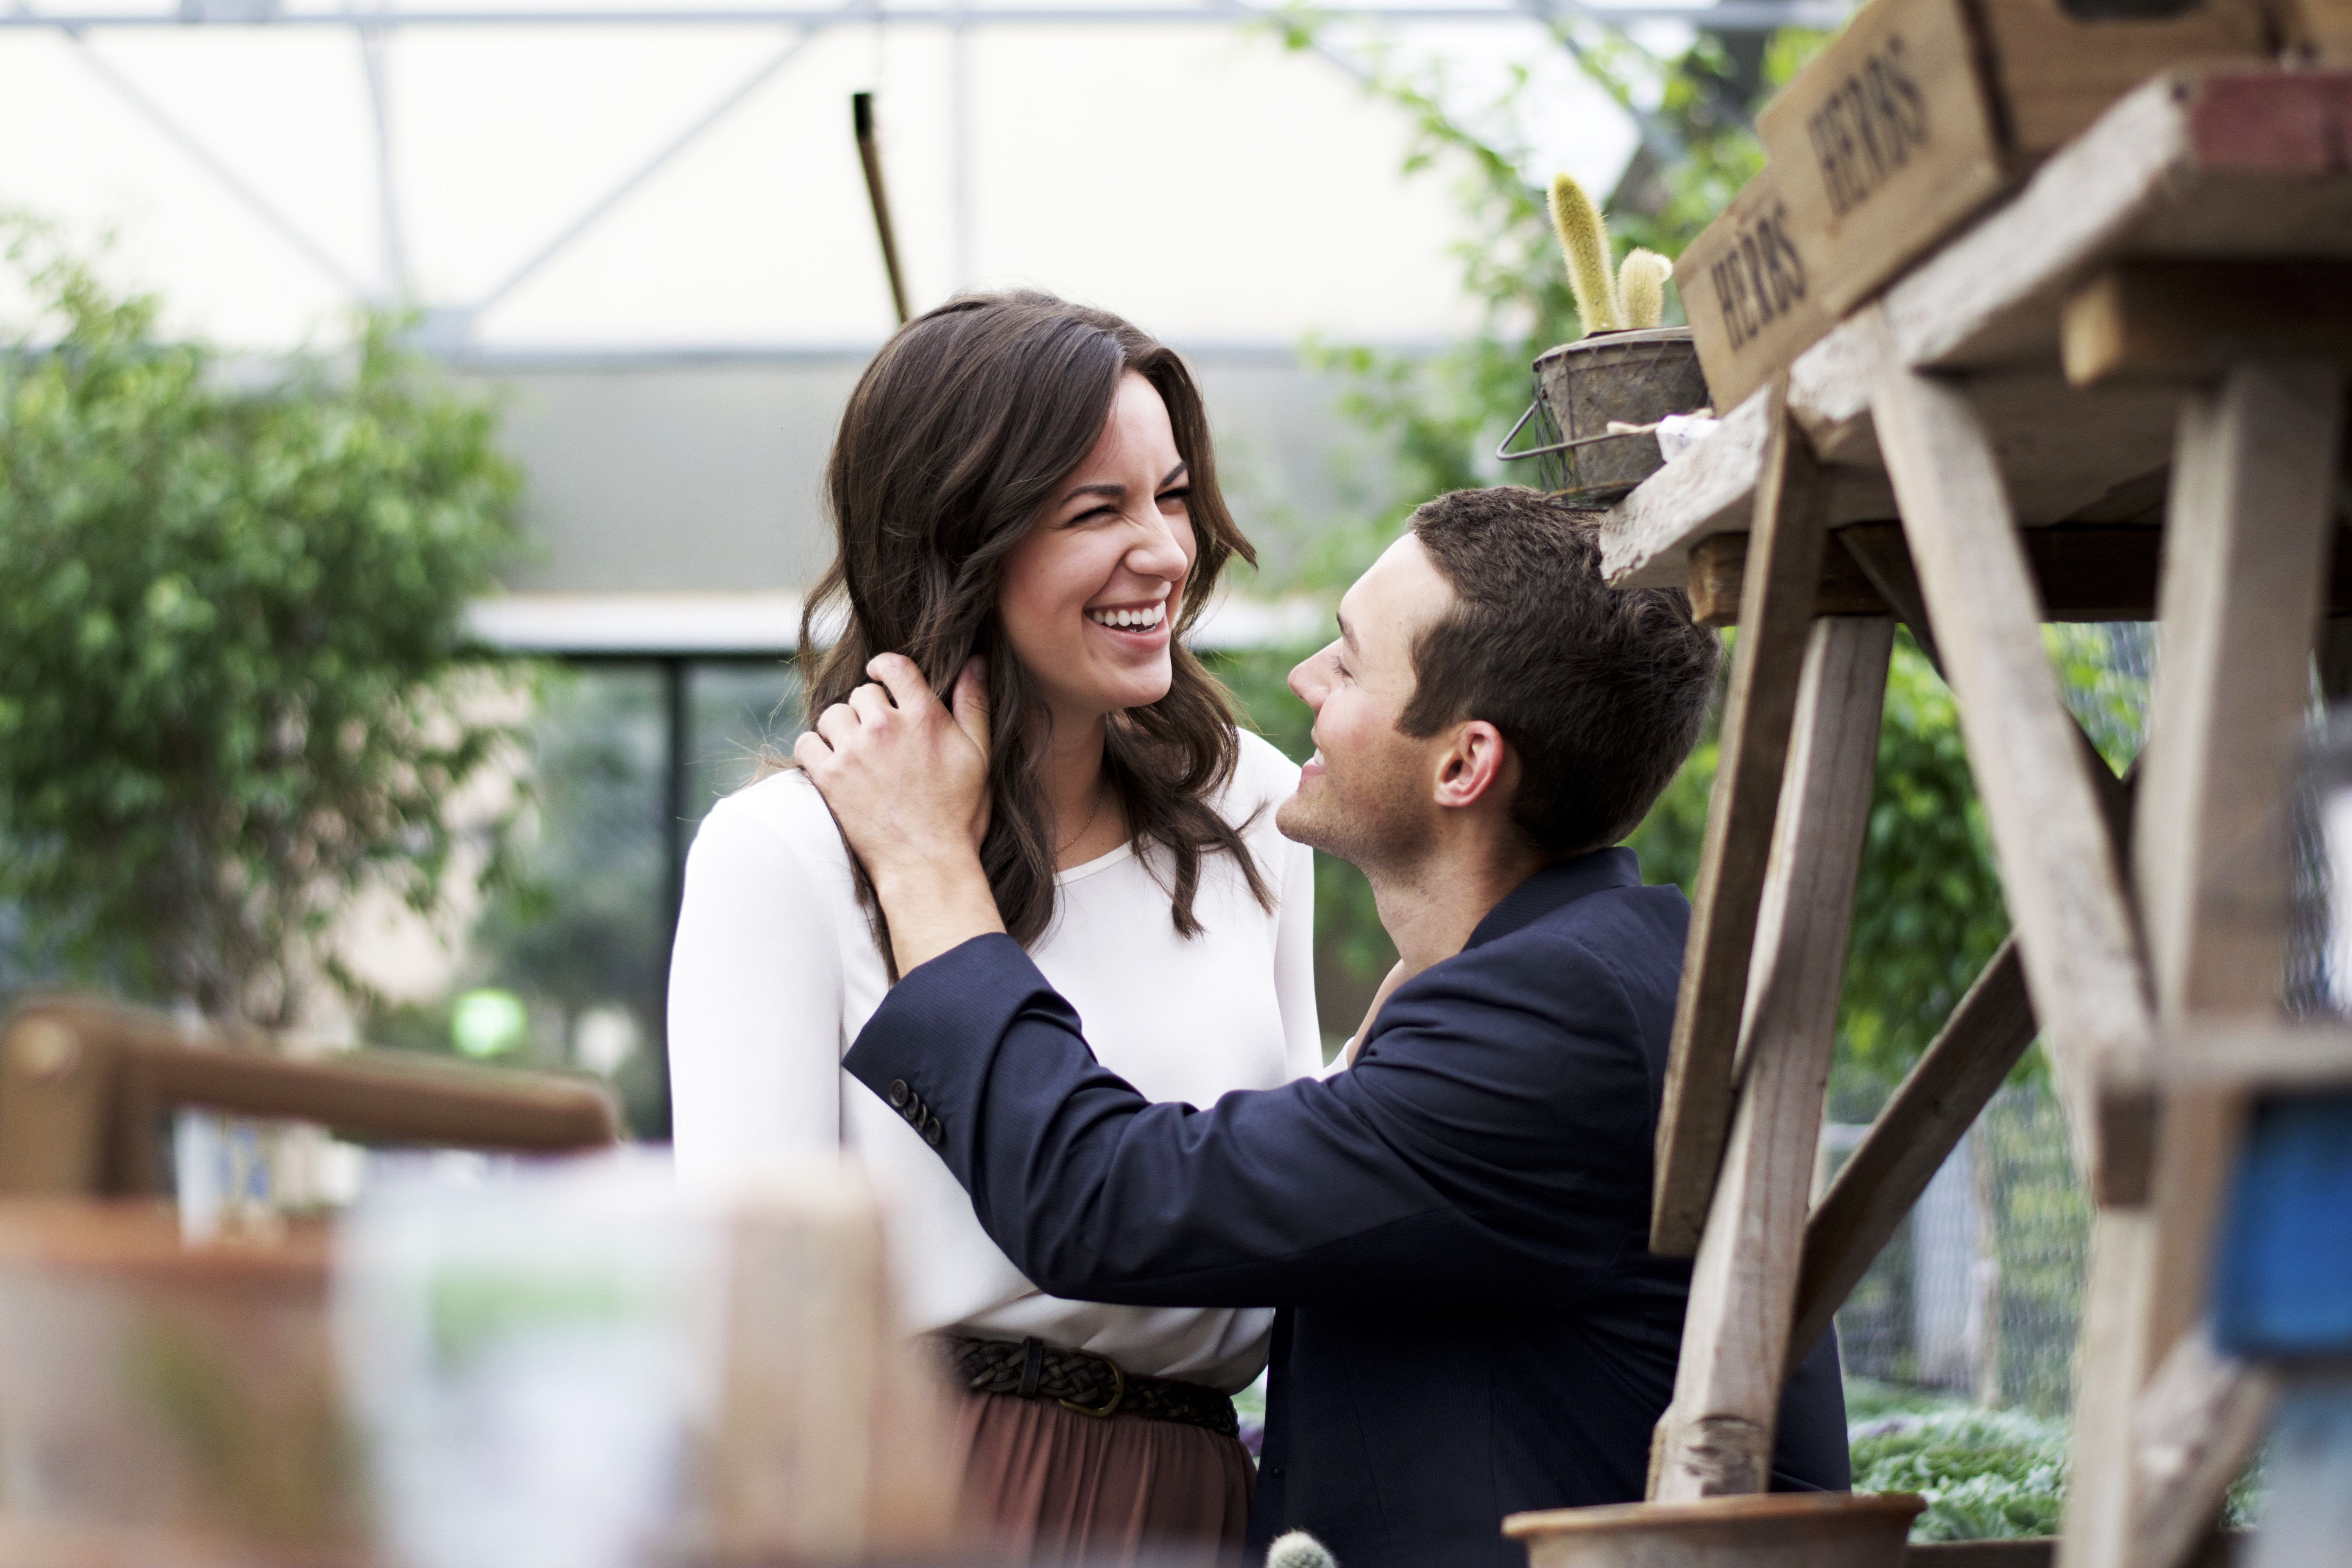 The greenhouse dallas tx - Greenhouse Engagement Photos Wedding Succulents Dallas Texas Photographer Camera Shi Photography